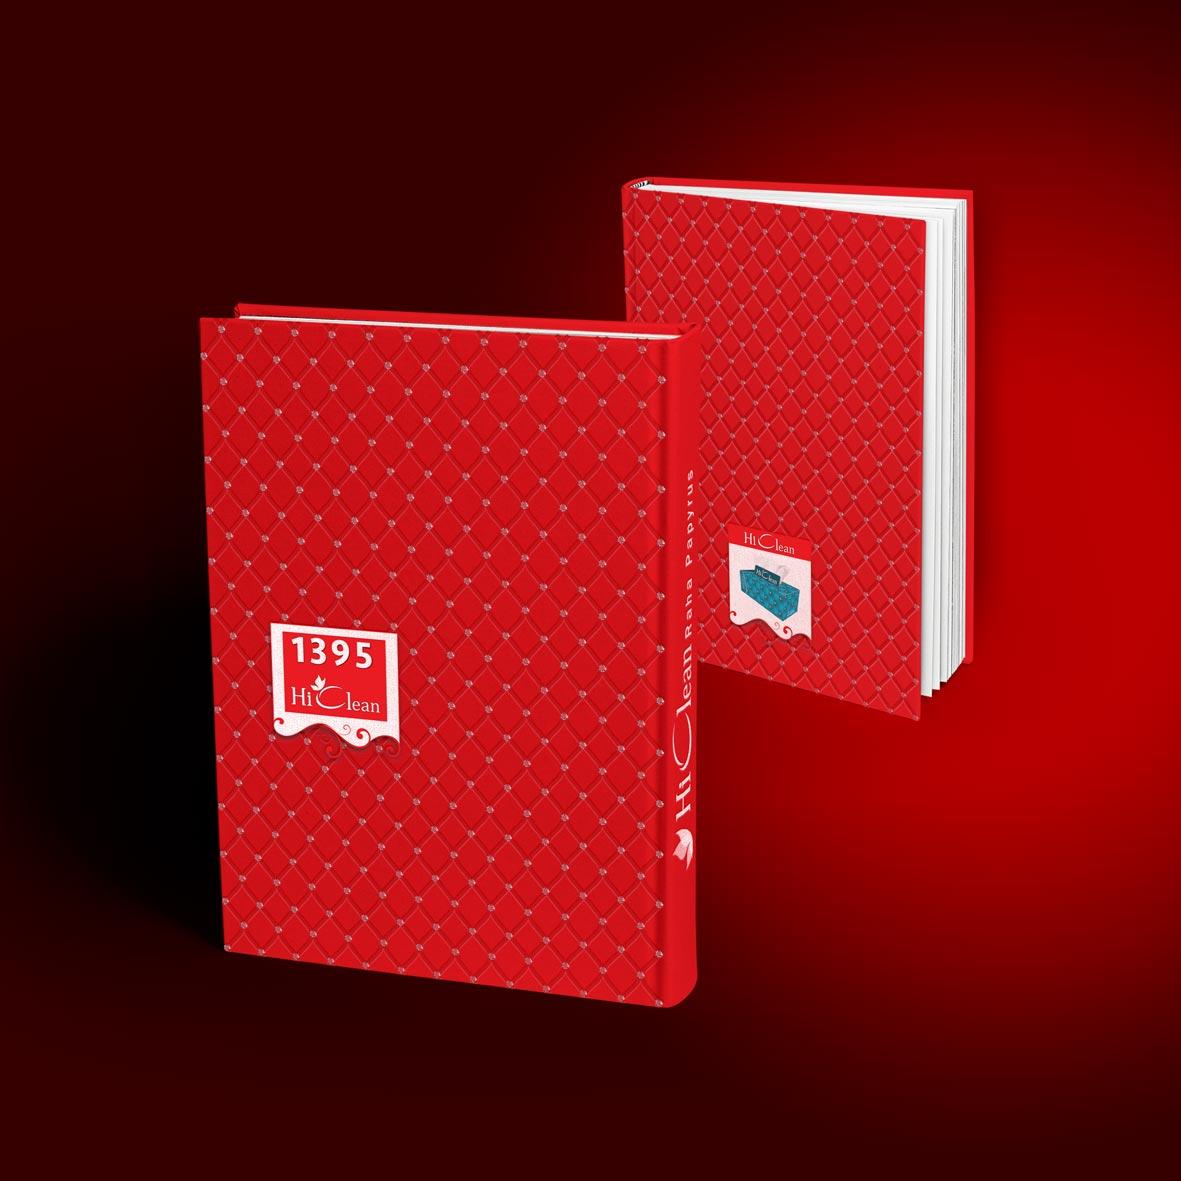 Hiclean-Book-Calendar-jeld